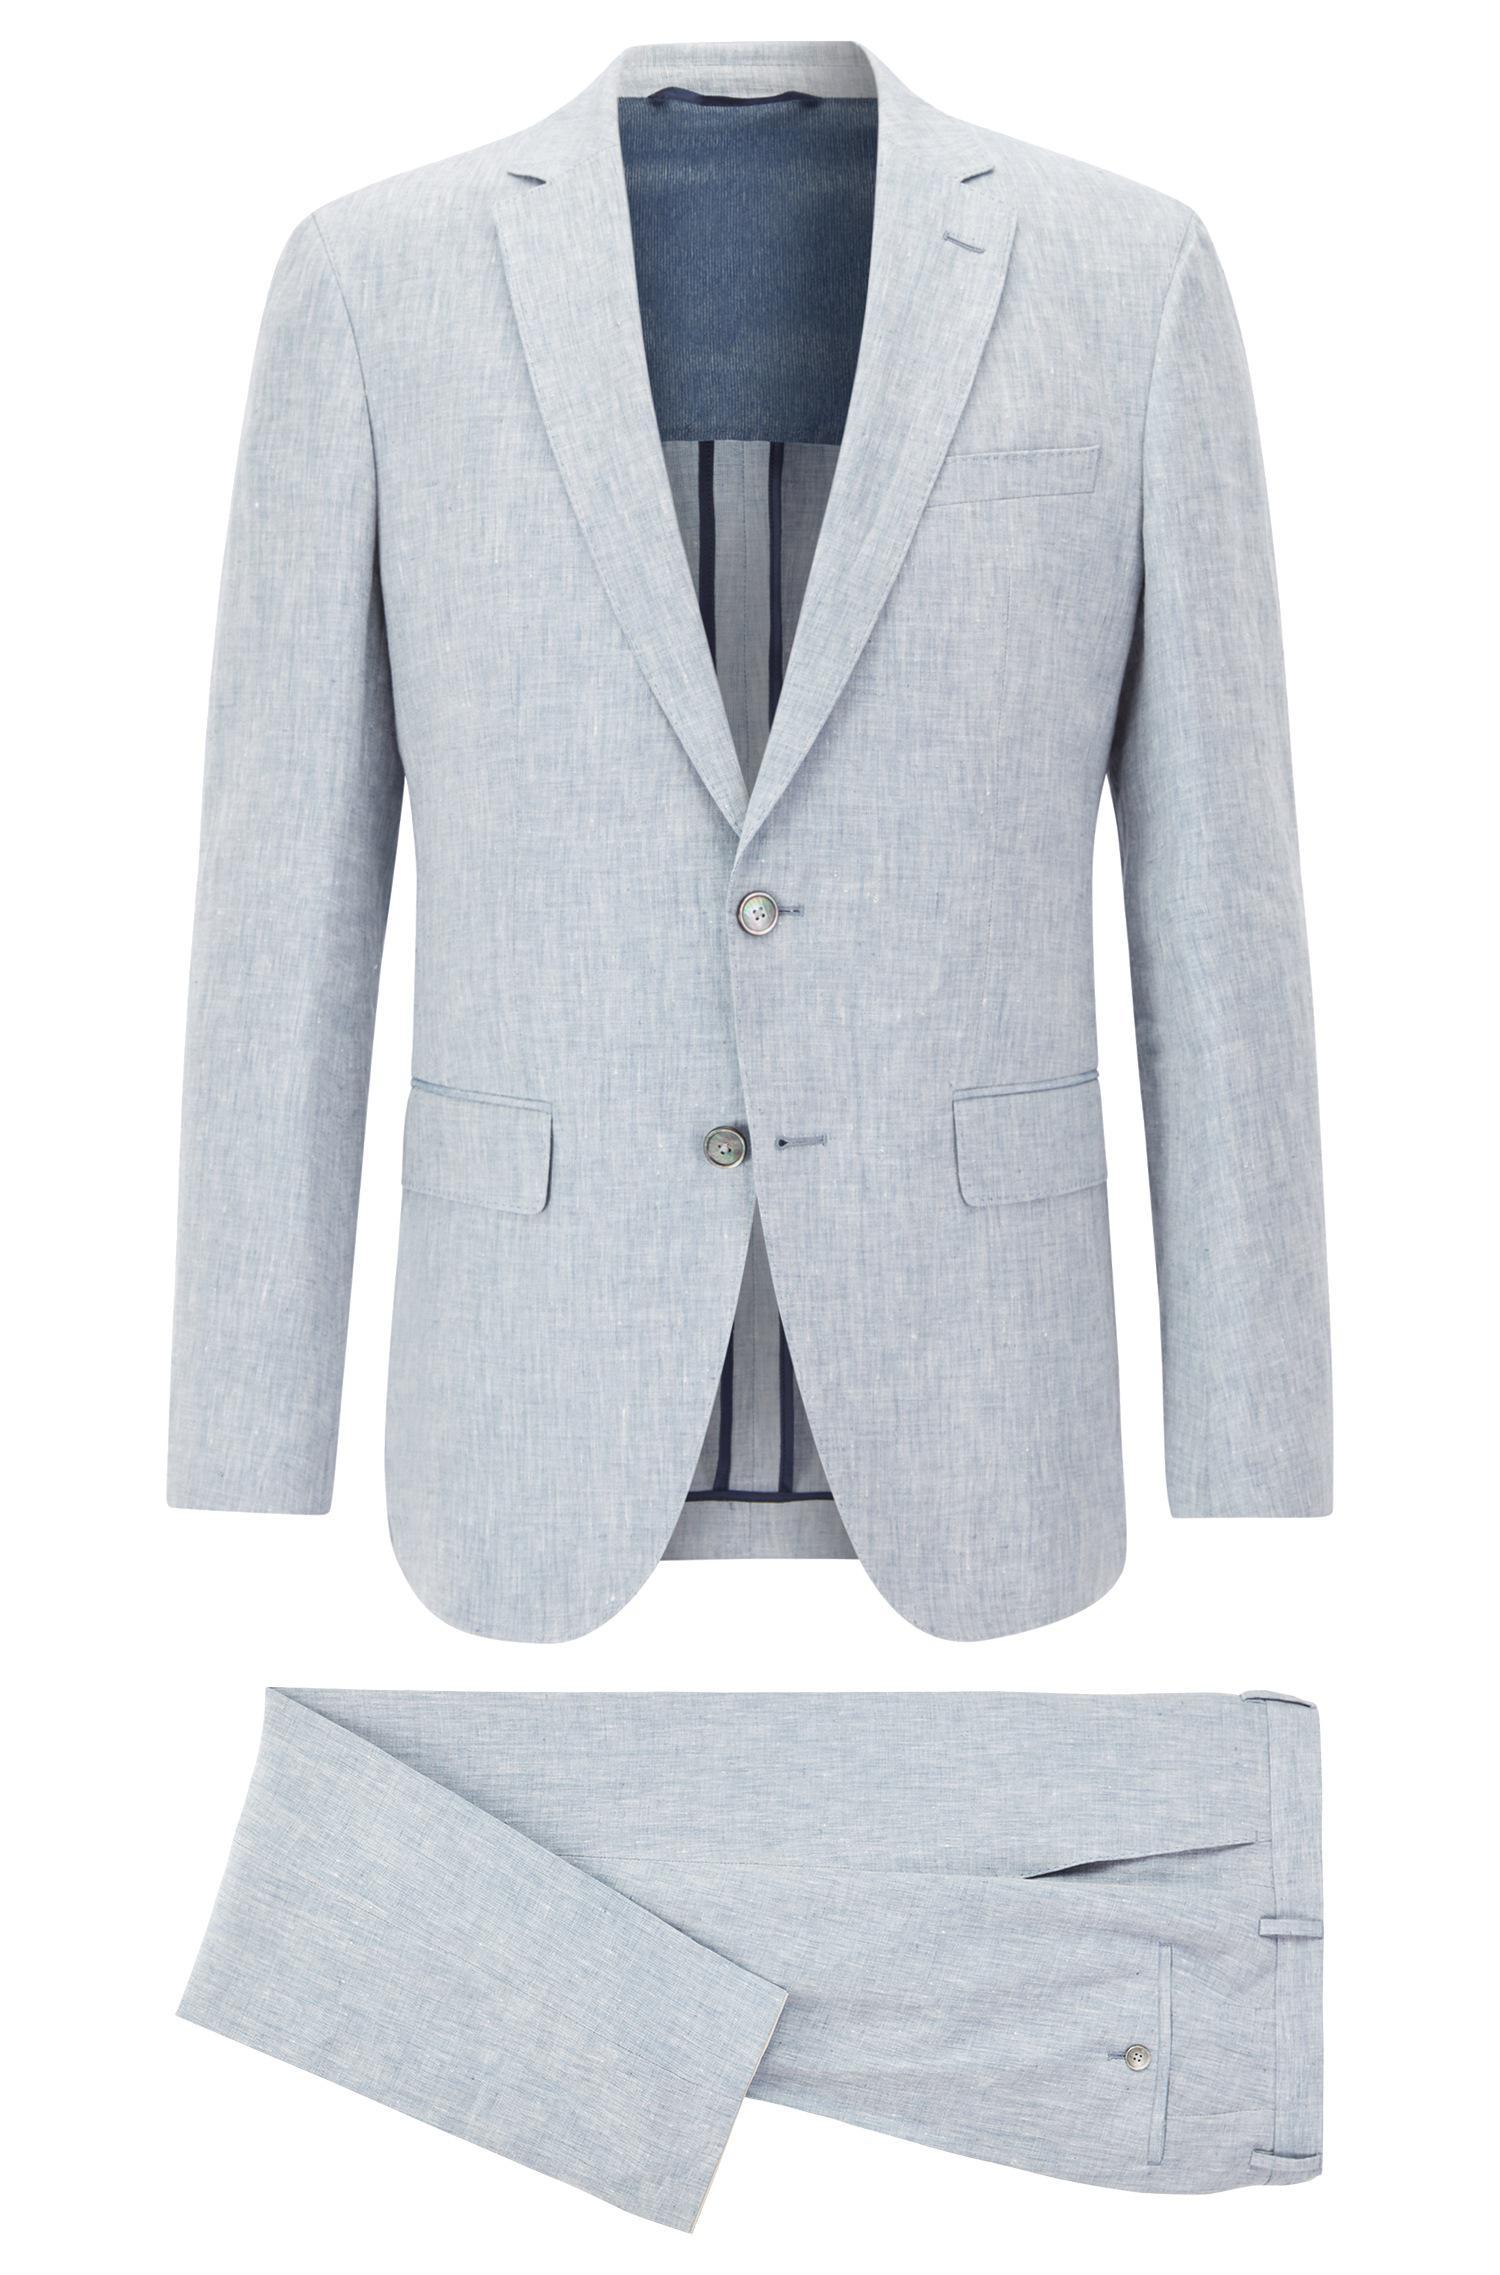 Boss Slim-fit Suit In Yarn-dyed Mélange Linen in Blue for Men - Lyst